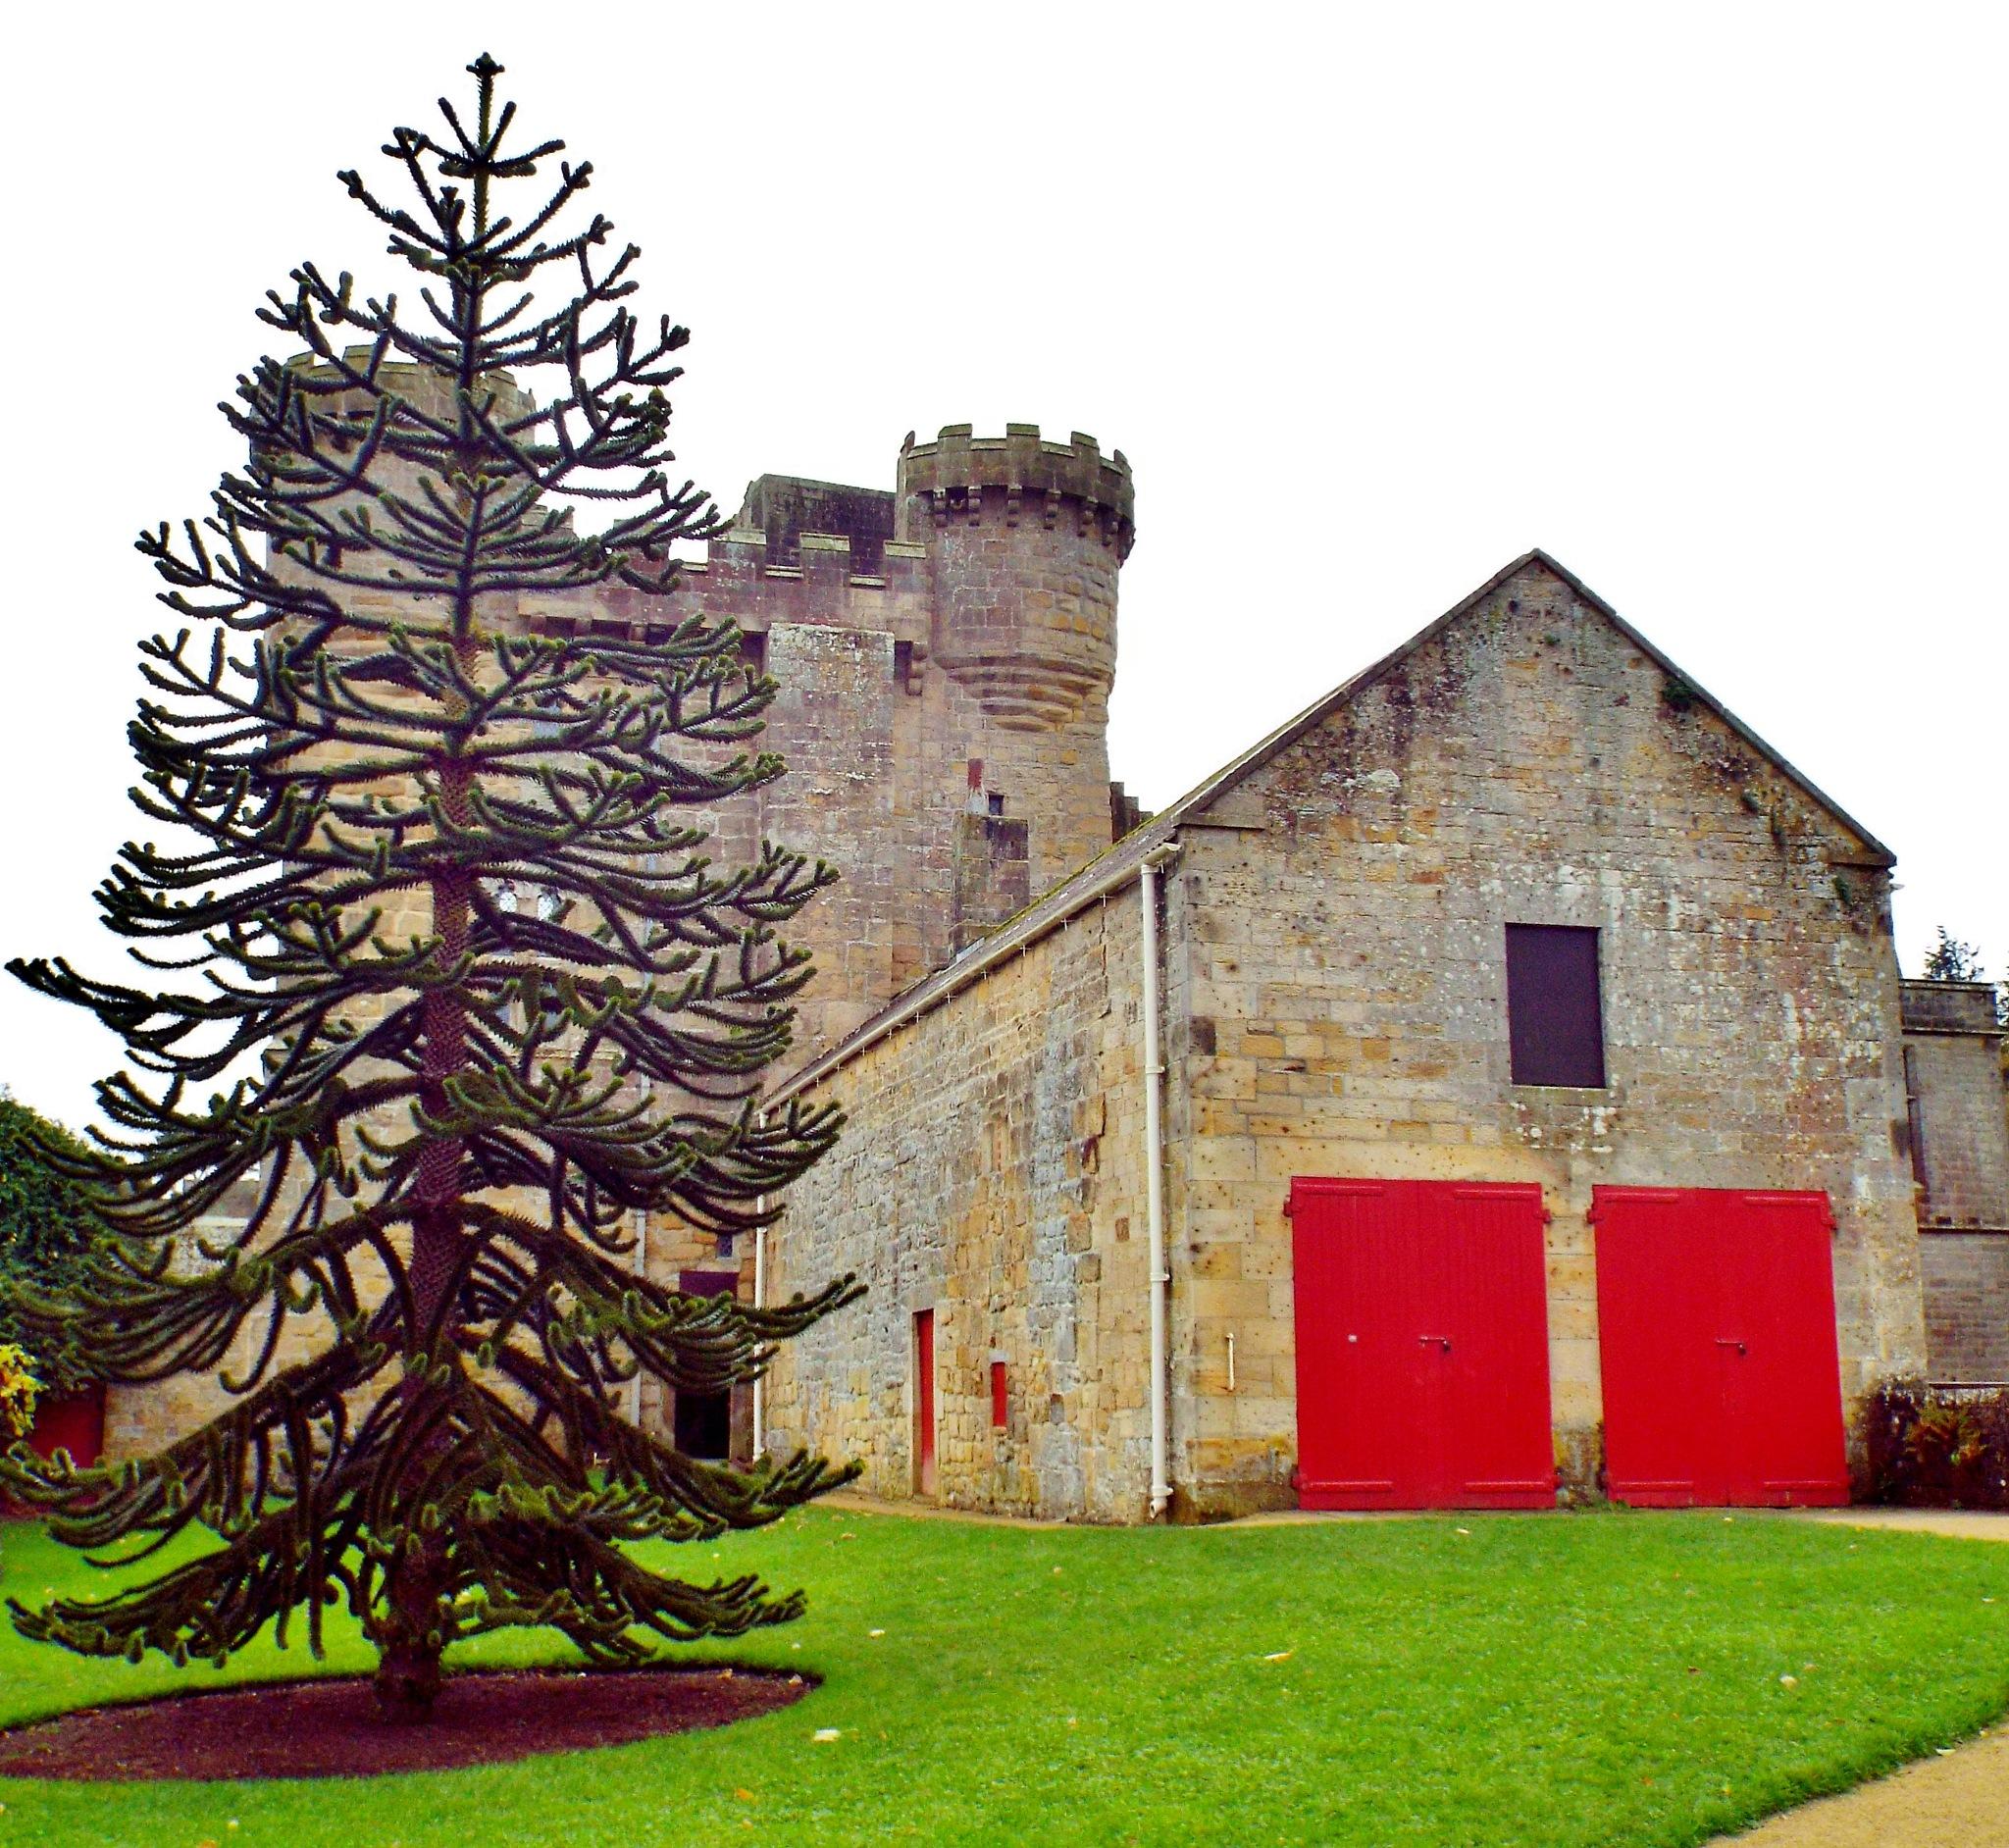 Belsay Castle by barbara.summers1